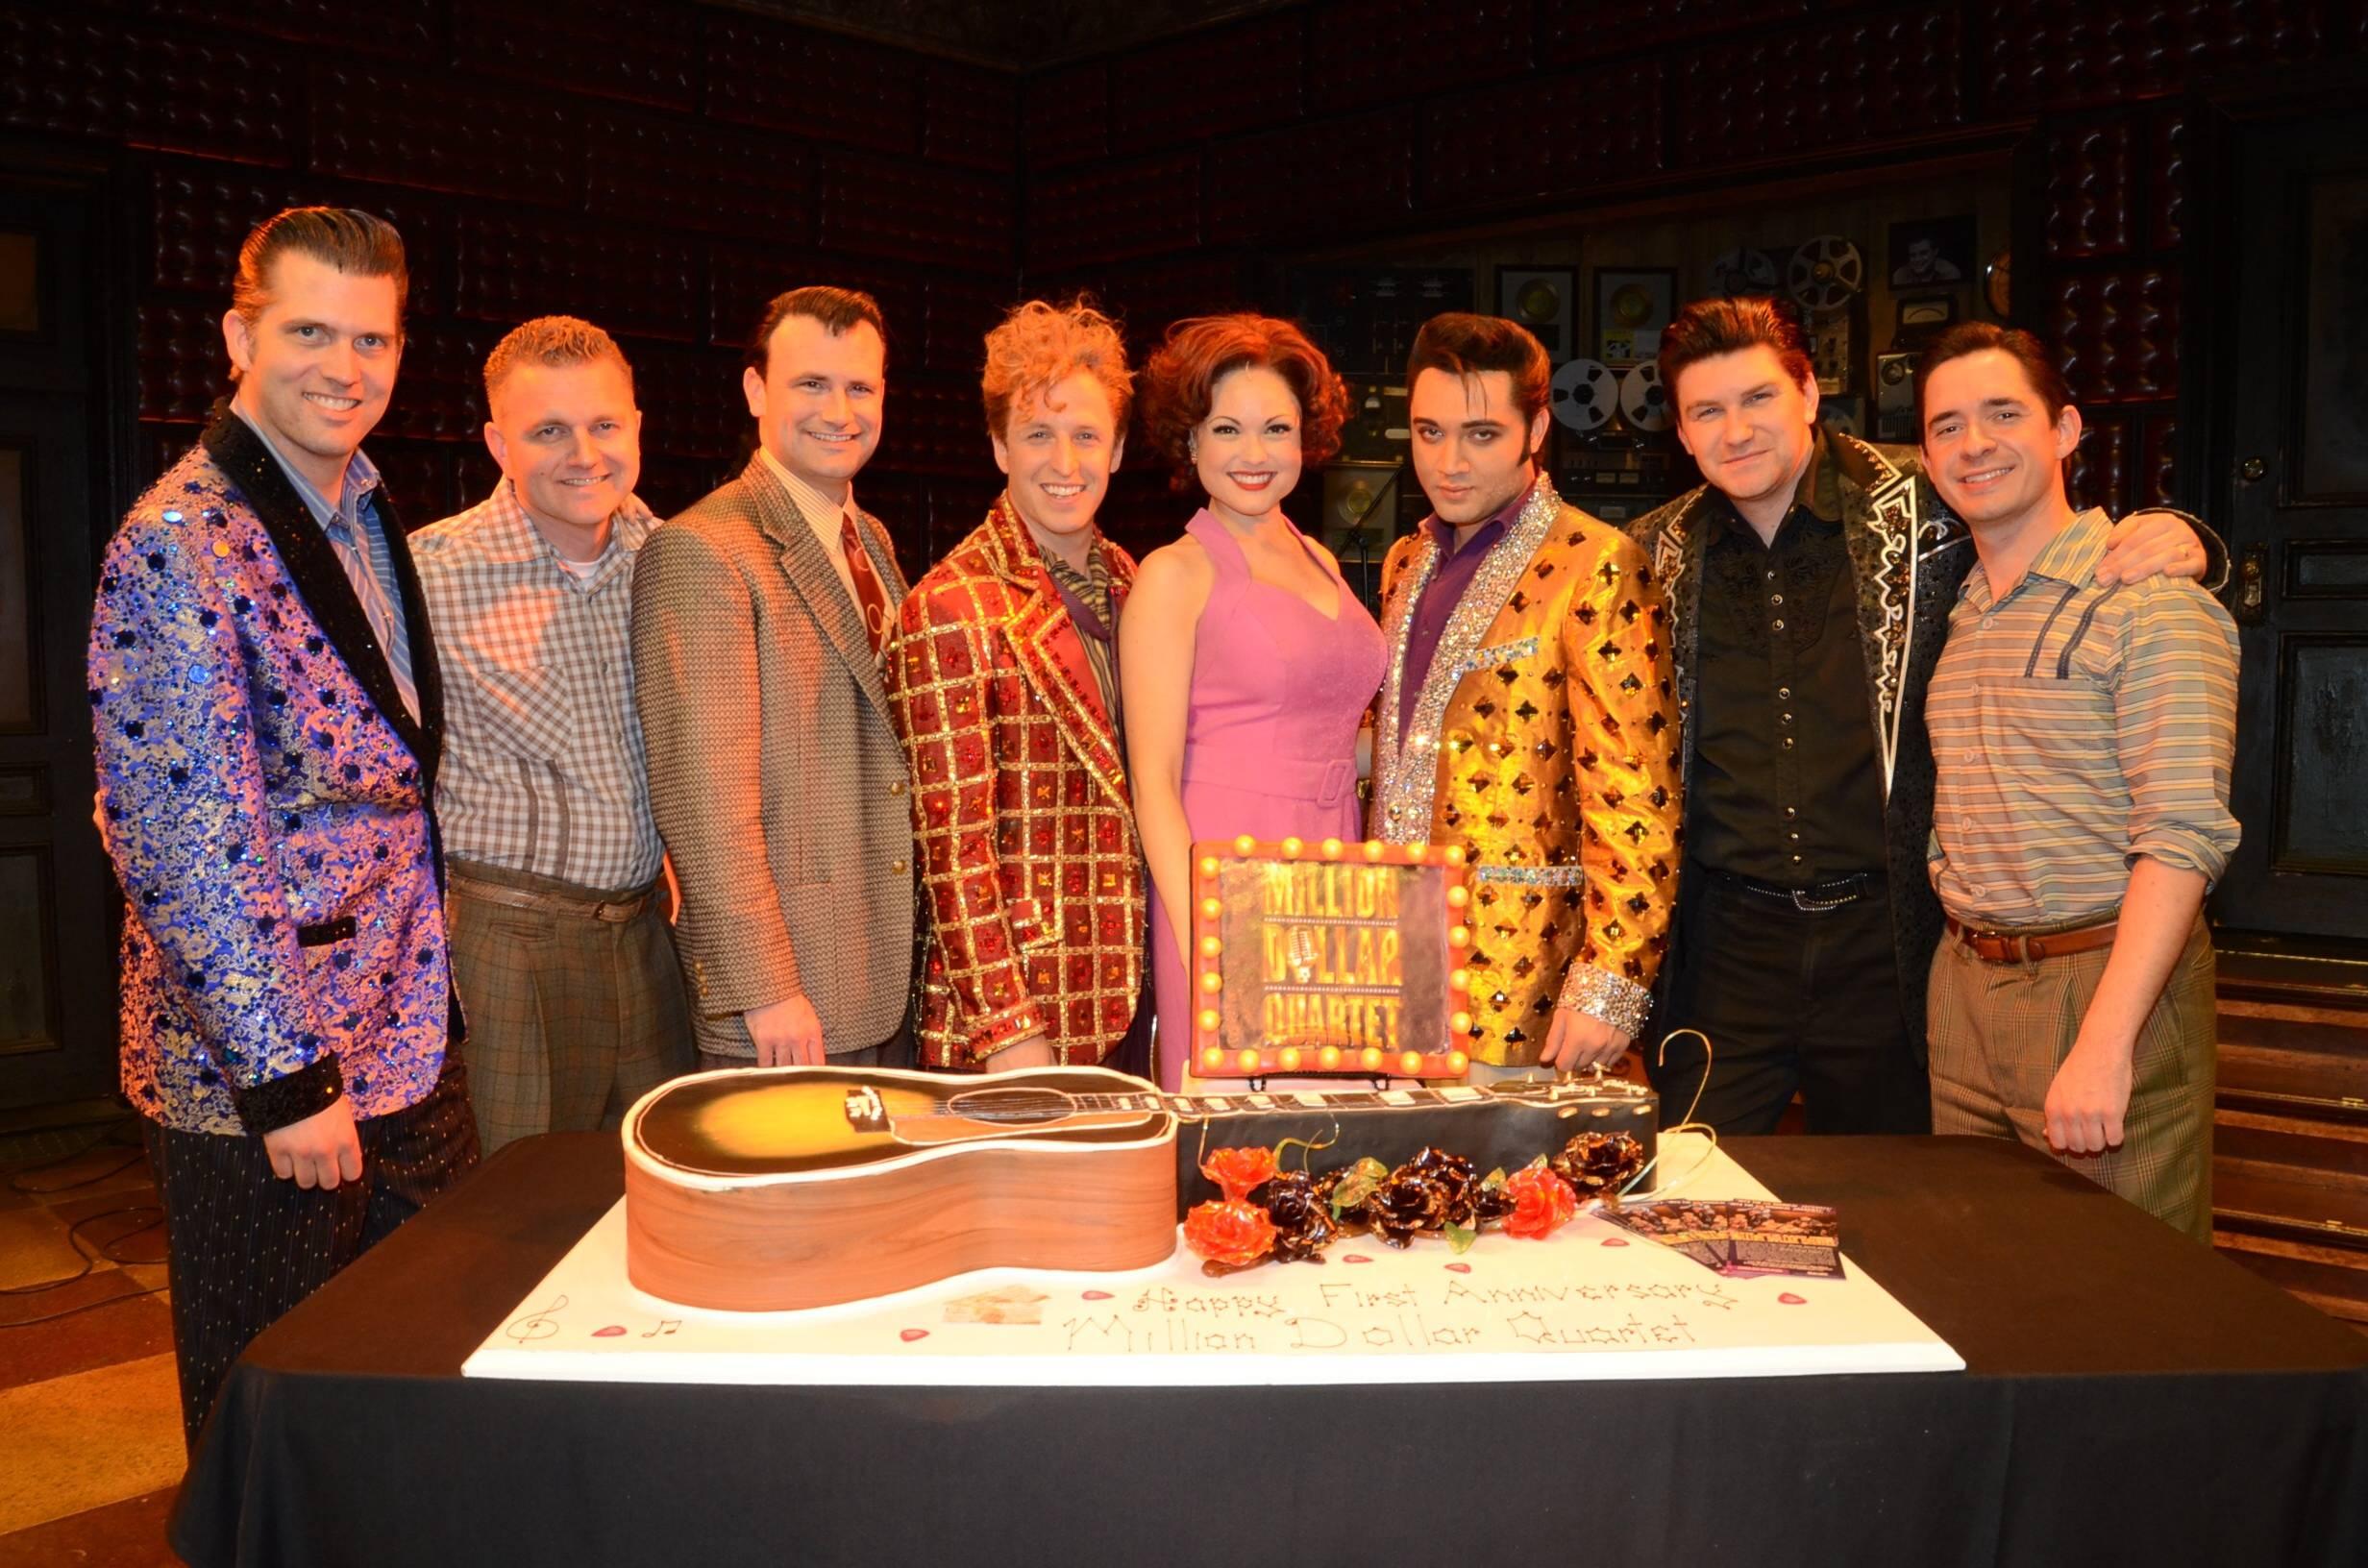 Cast of Million Dollar Quartet Las Vegas 2; First Anniversary 2.19.14 ©Caesars Entertainment